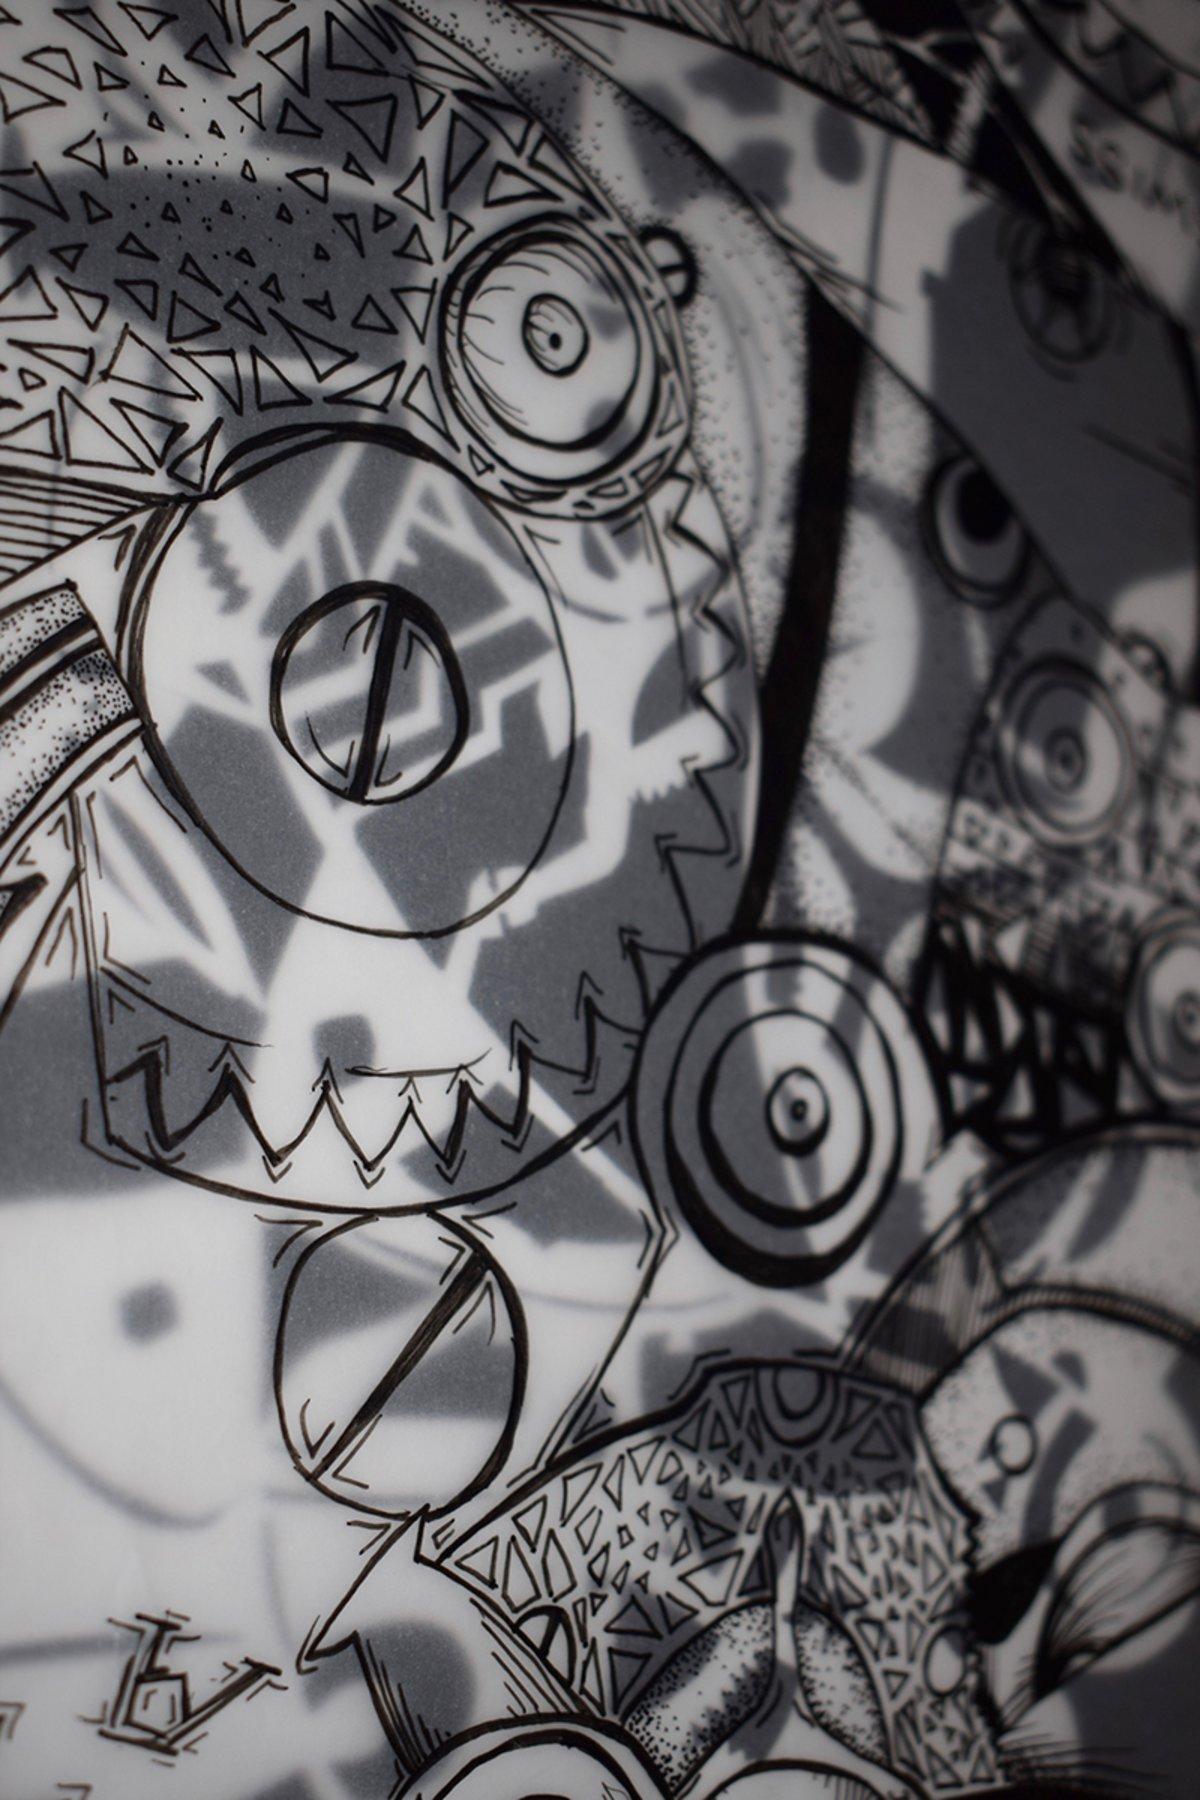 Nefeli Naoum - The Deconstruction of Time